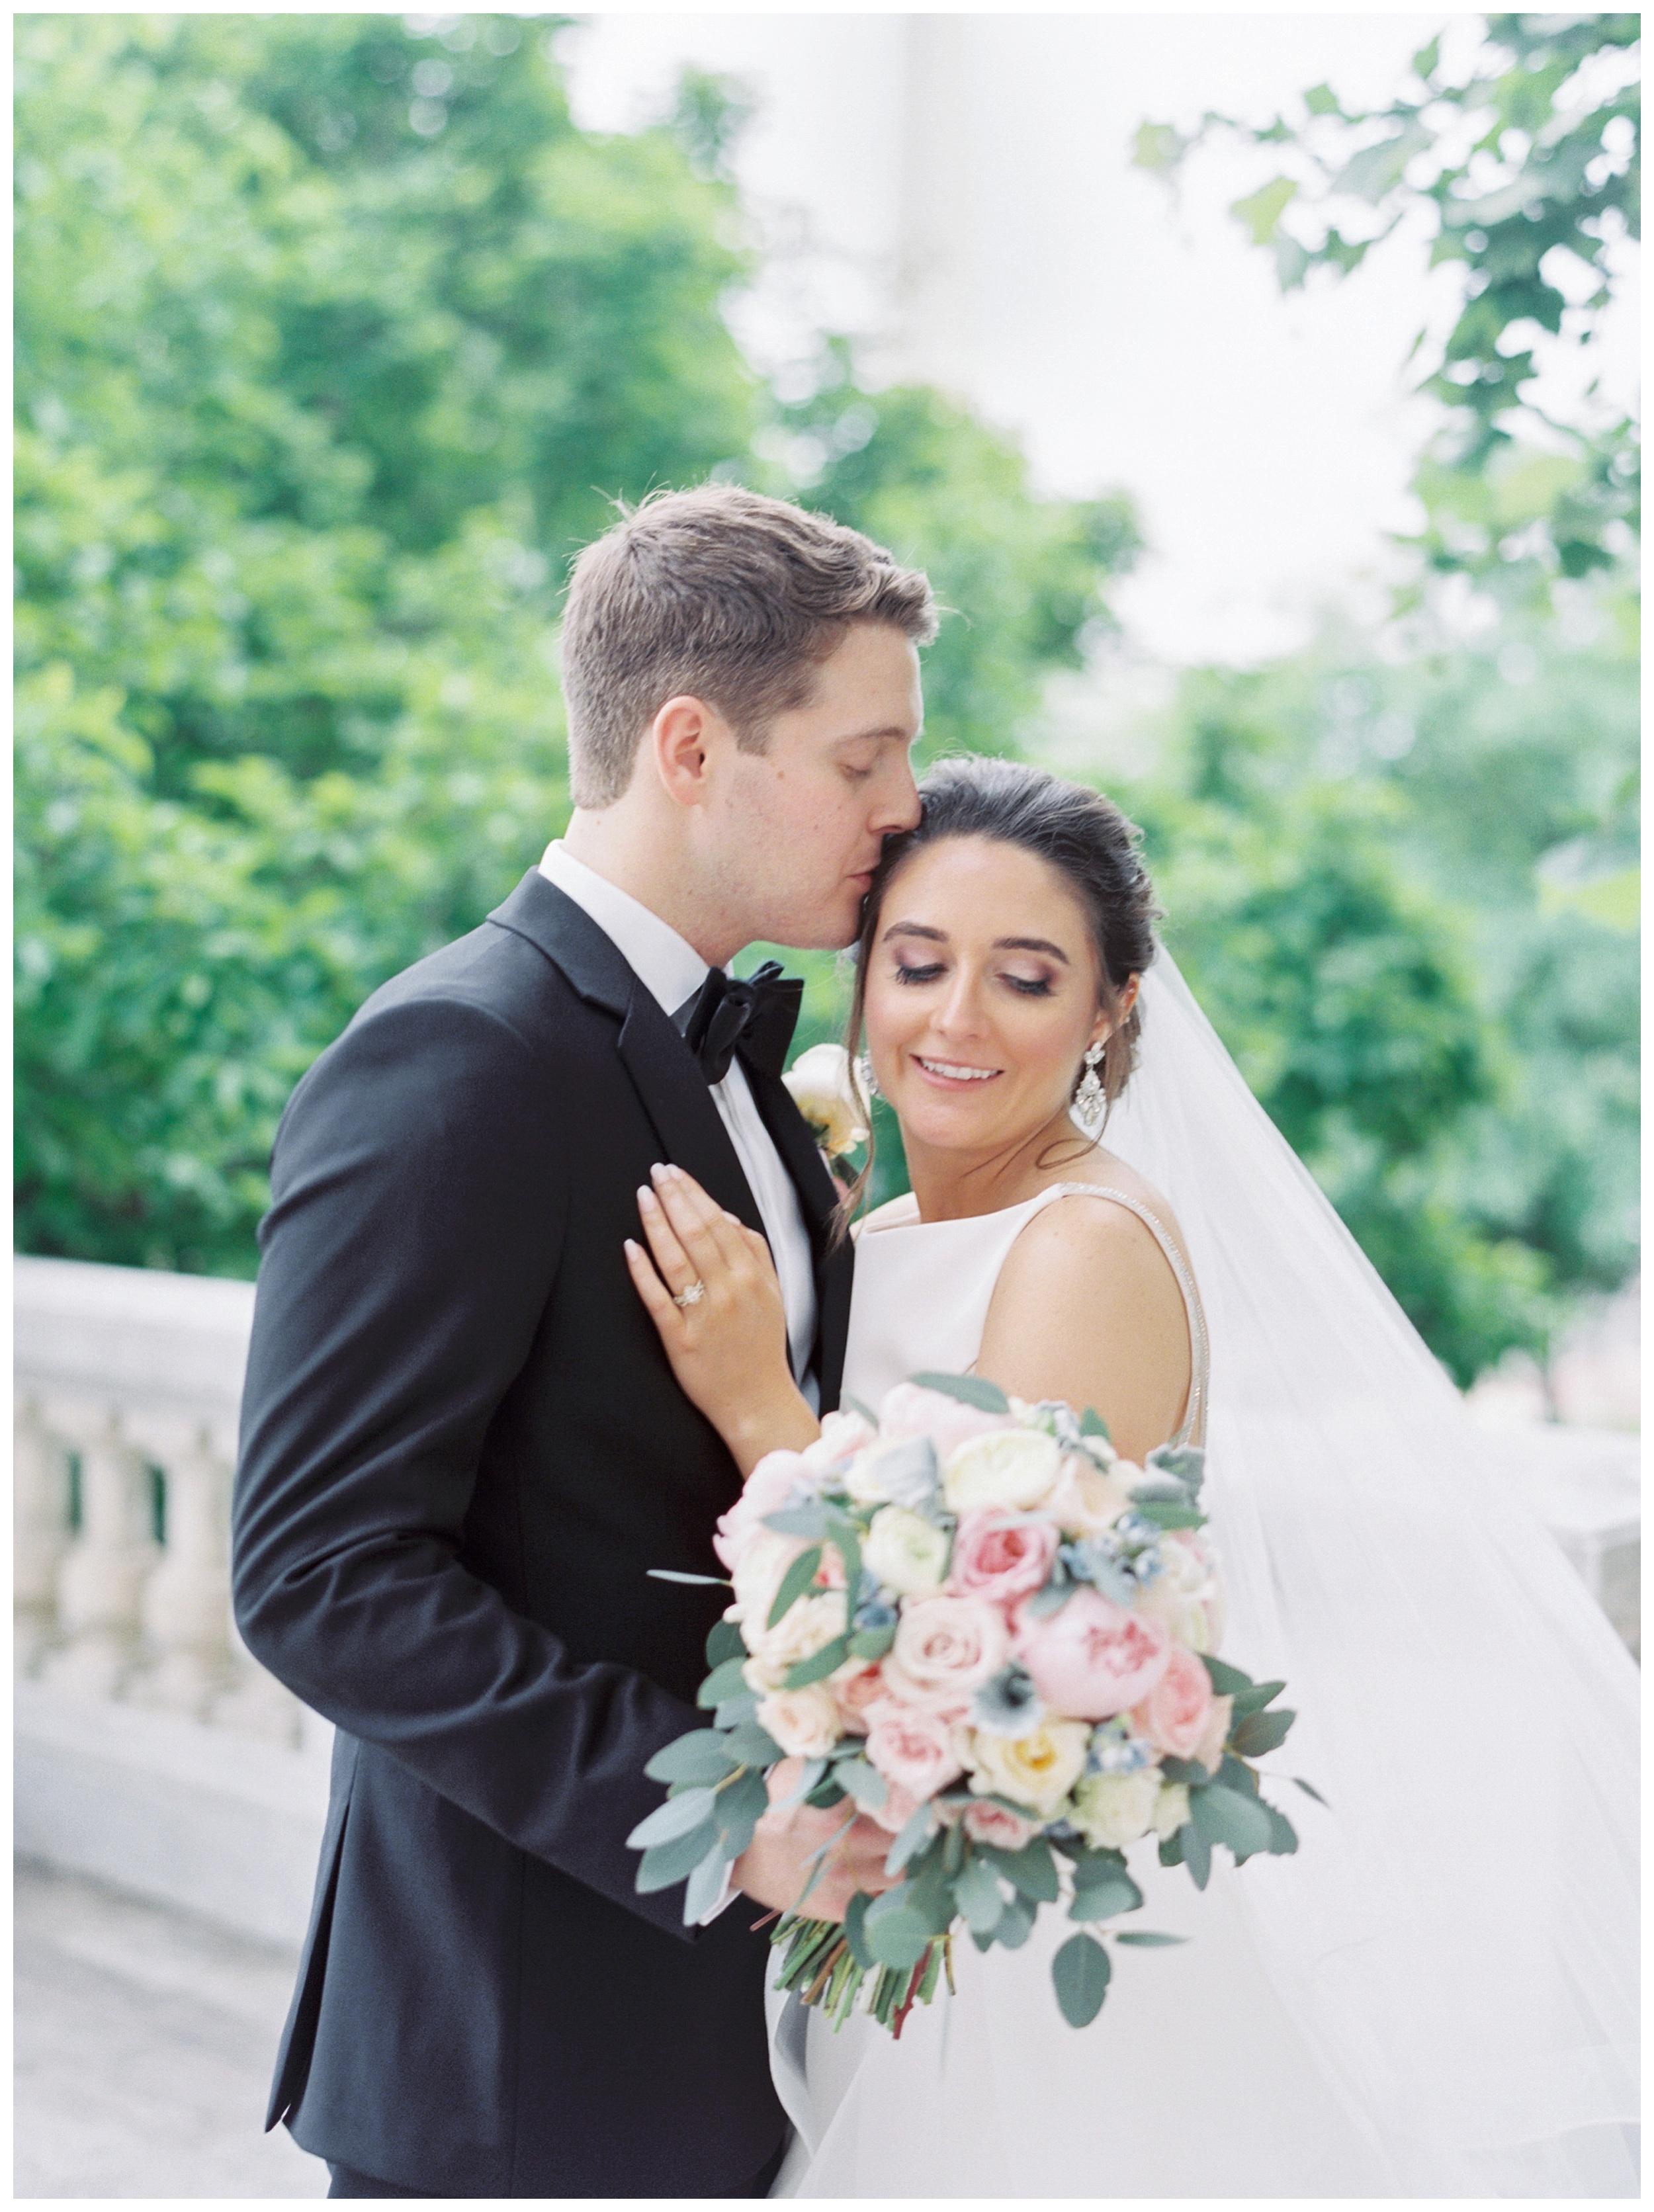 DAR Constitution Hall Wedding Wedding | Daughters of the American Revolution Wedding | District of Columbia Film Wedding Photographer Kir Tuben_0100.jpg